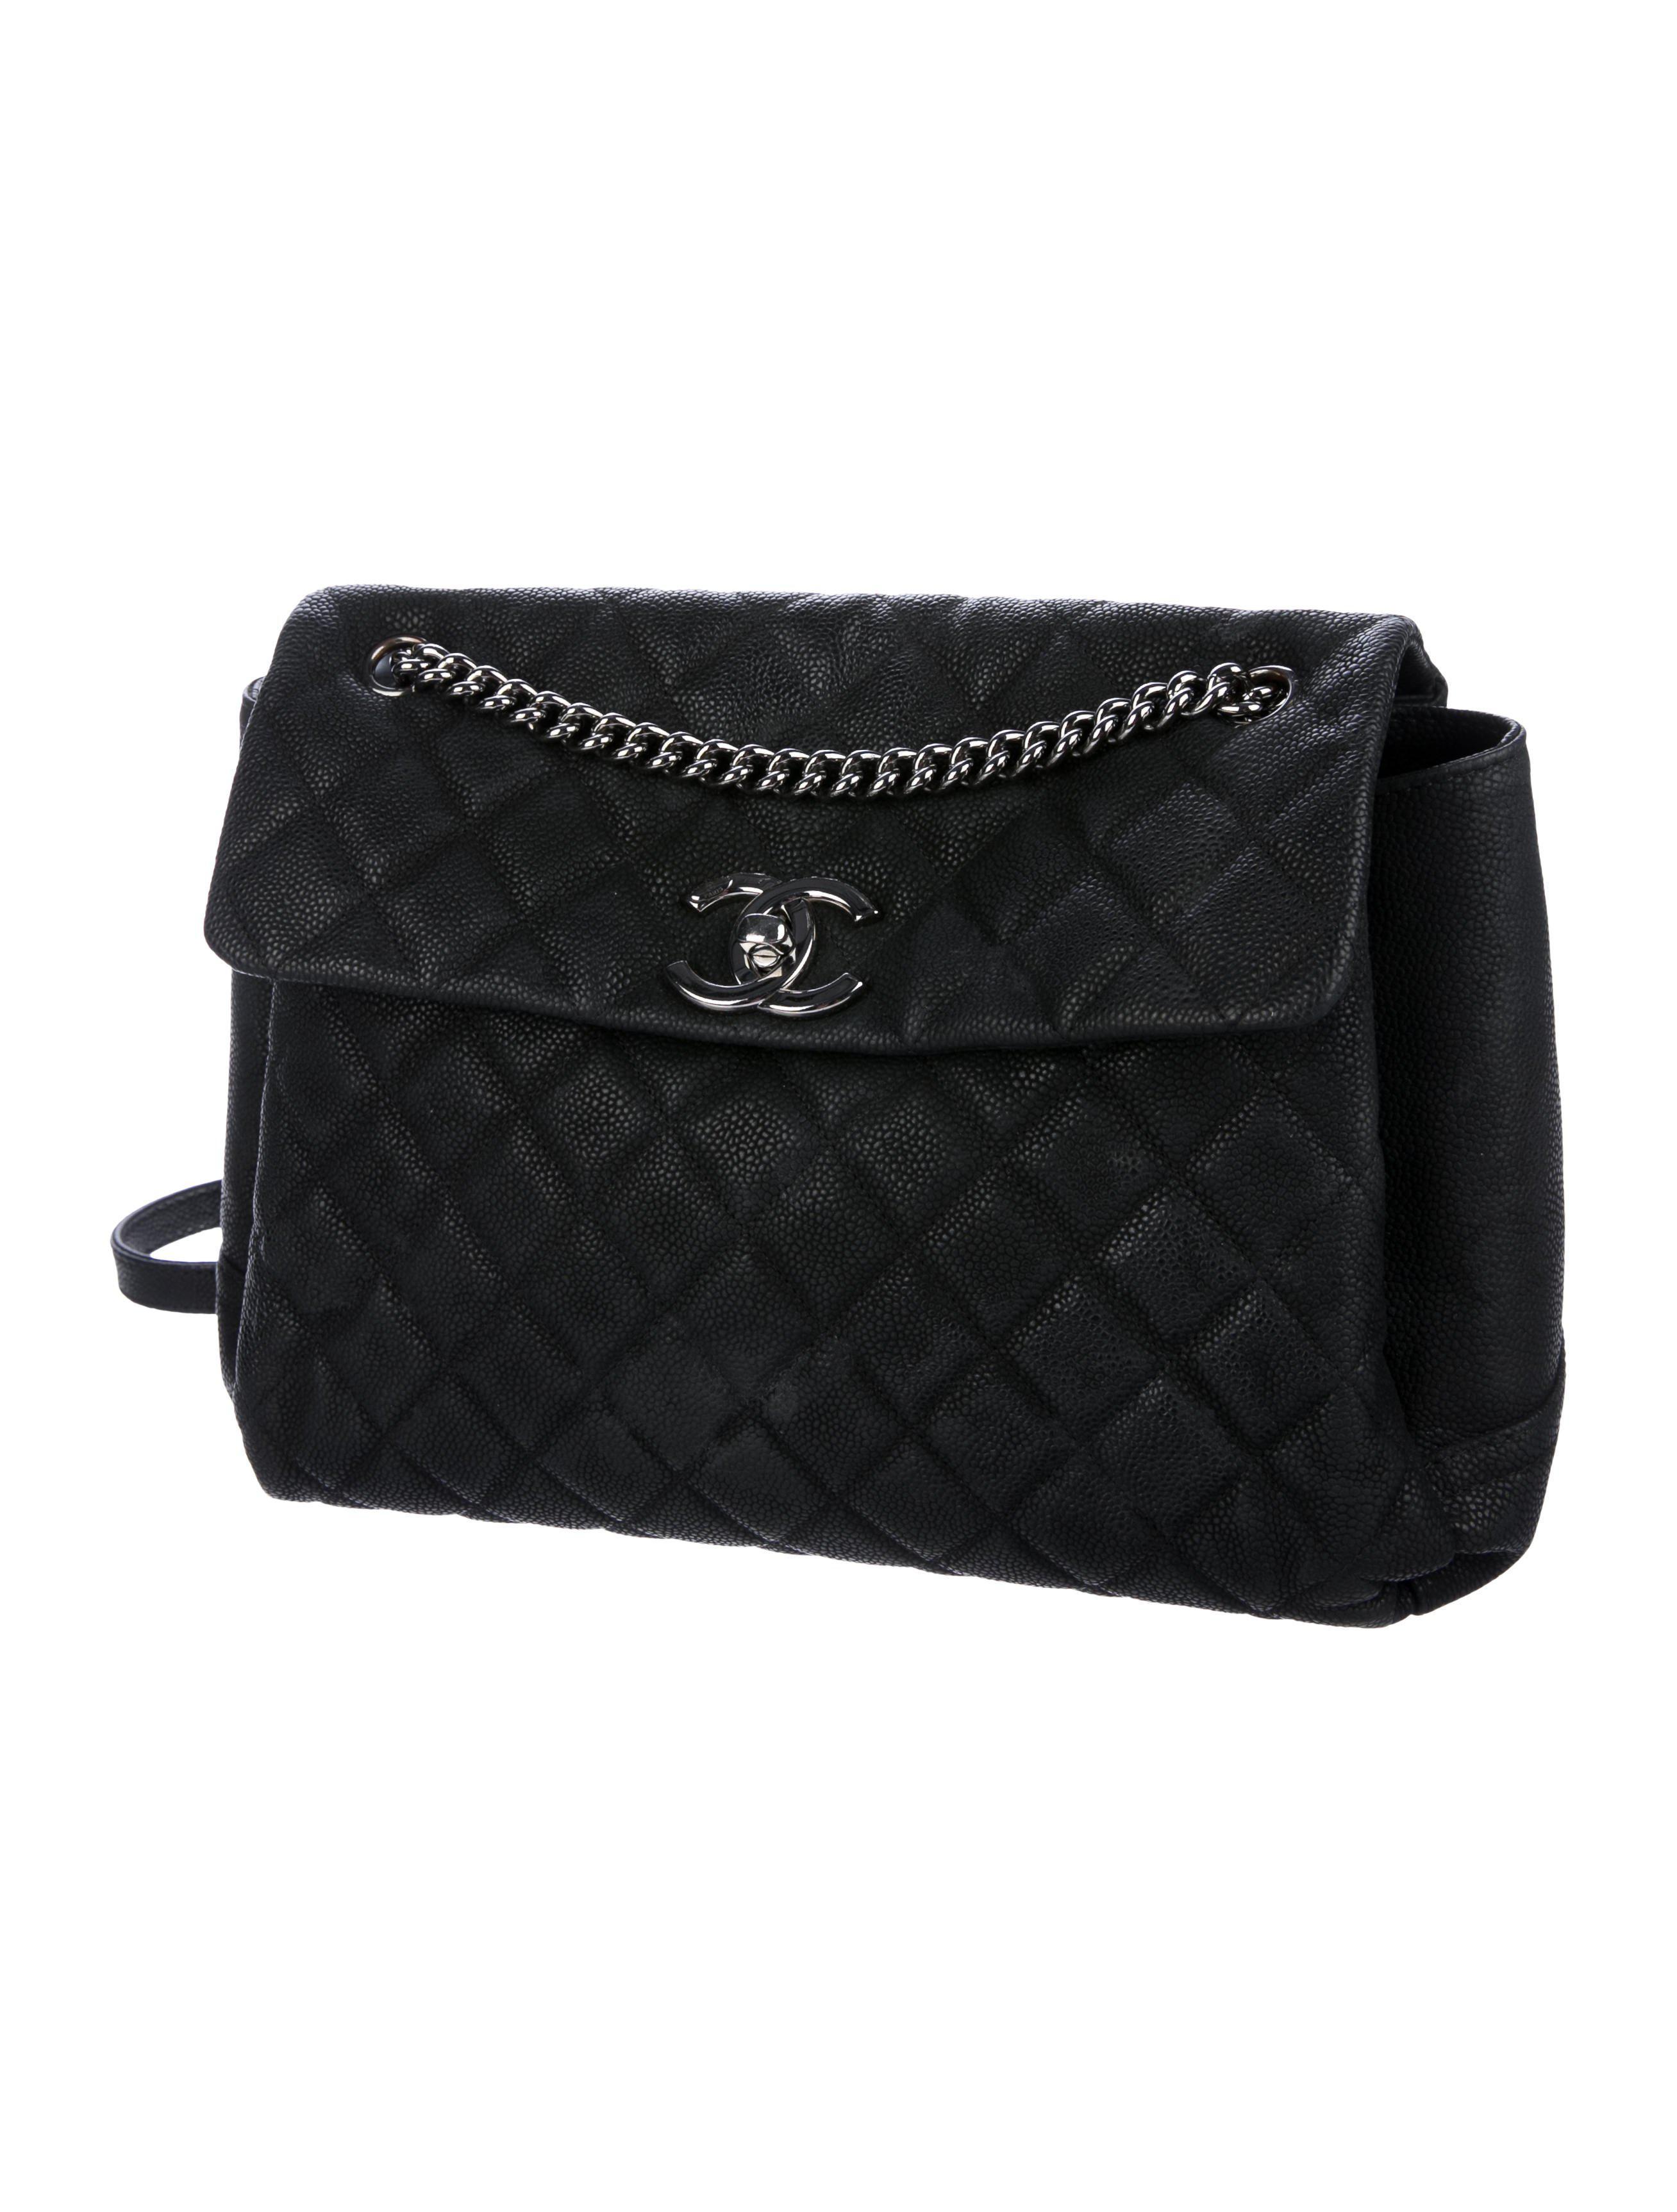 46692c607b88c9 Chanel - Metallic Lady Pearly Flap Bag Black - Lyst. View Fullscreen